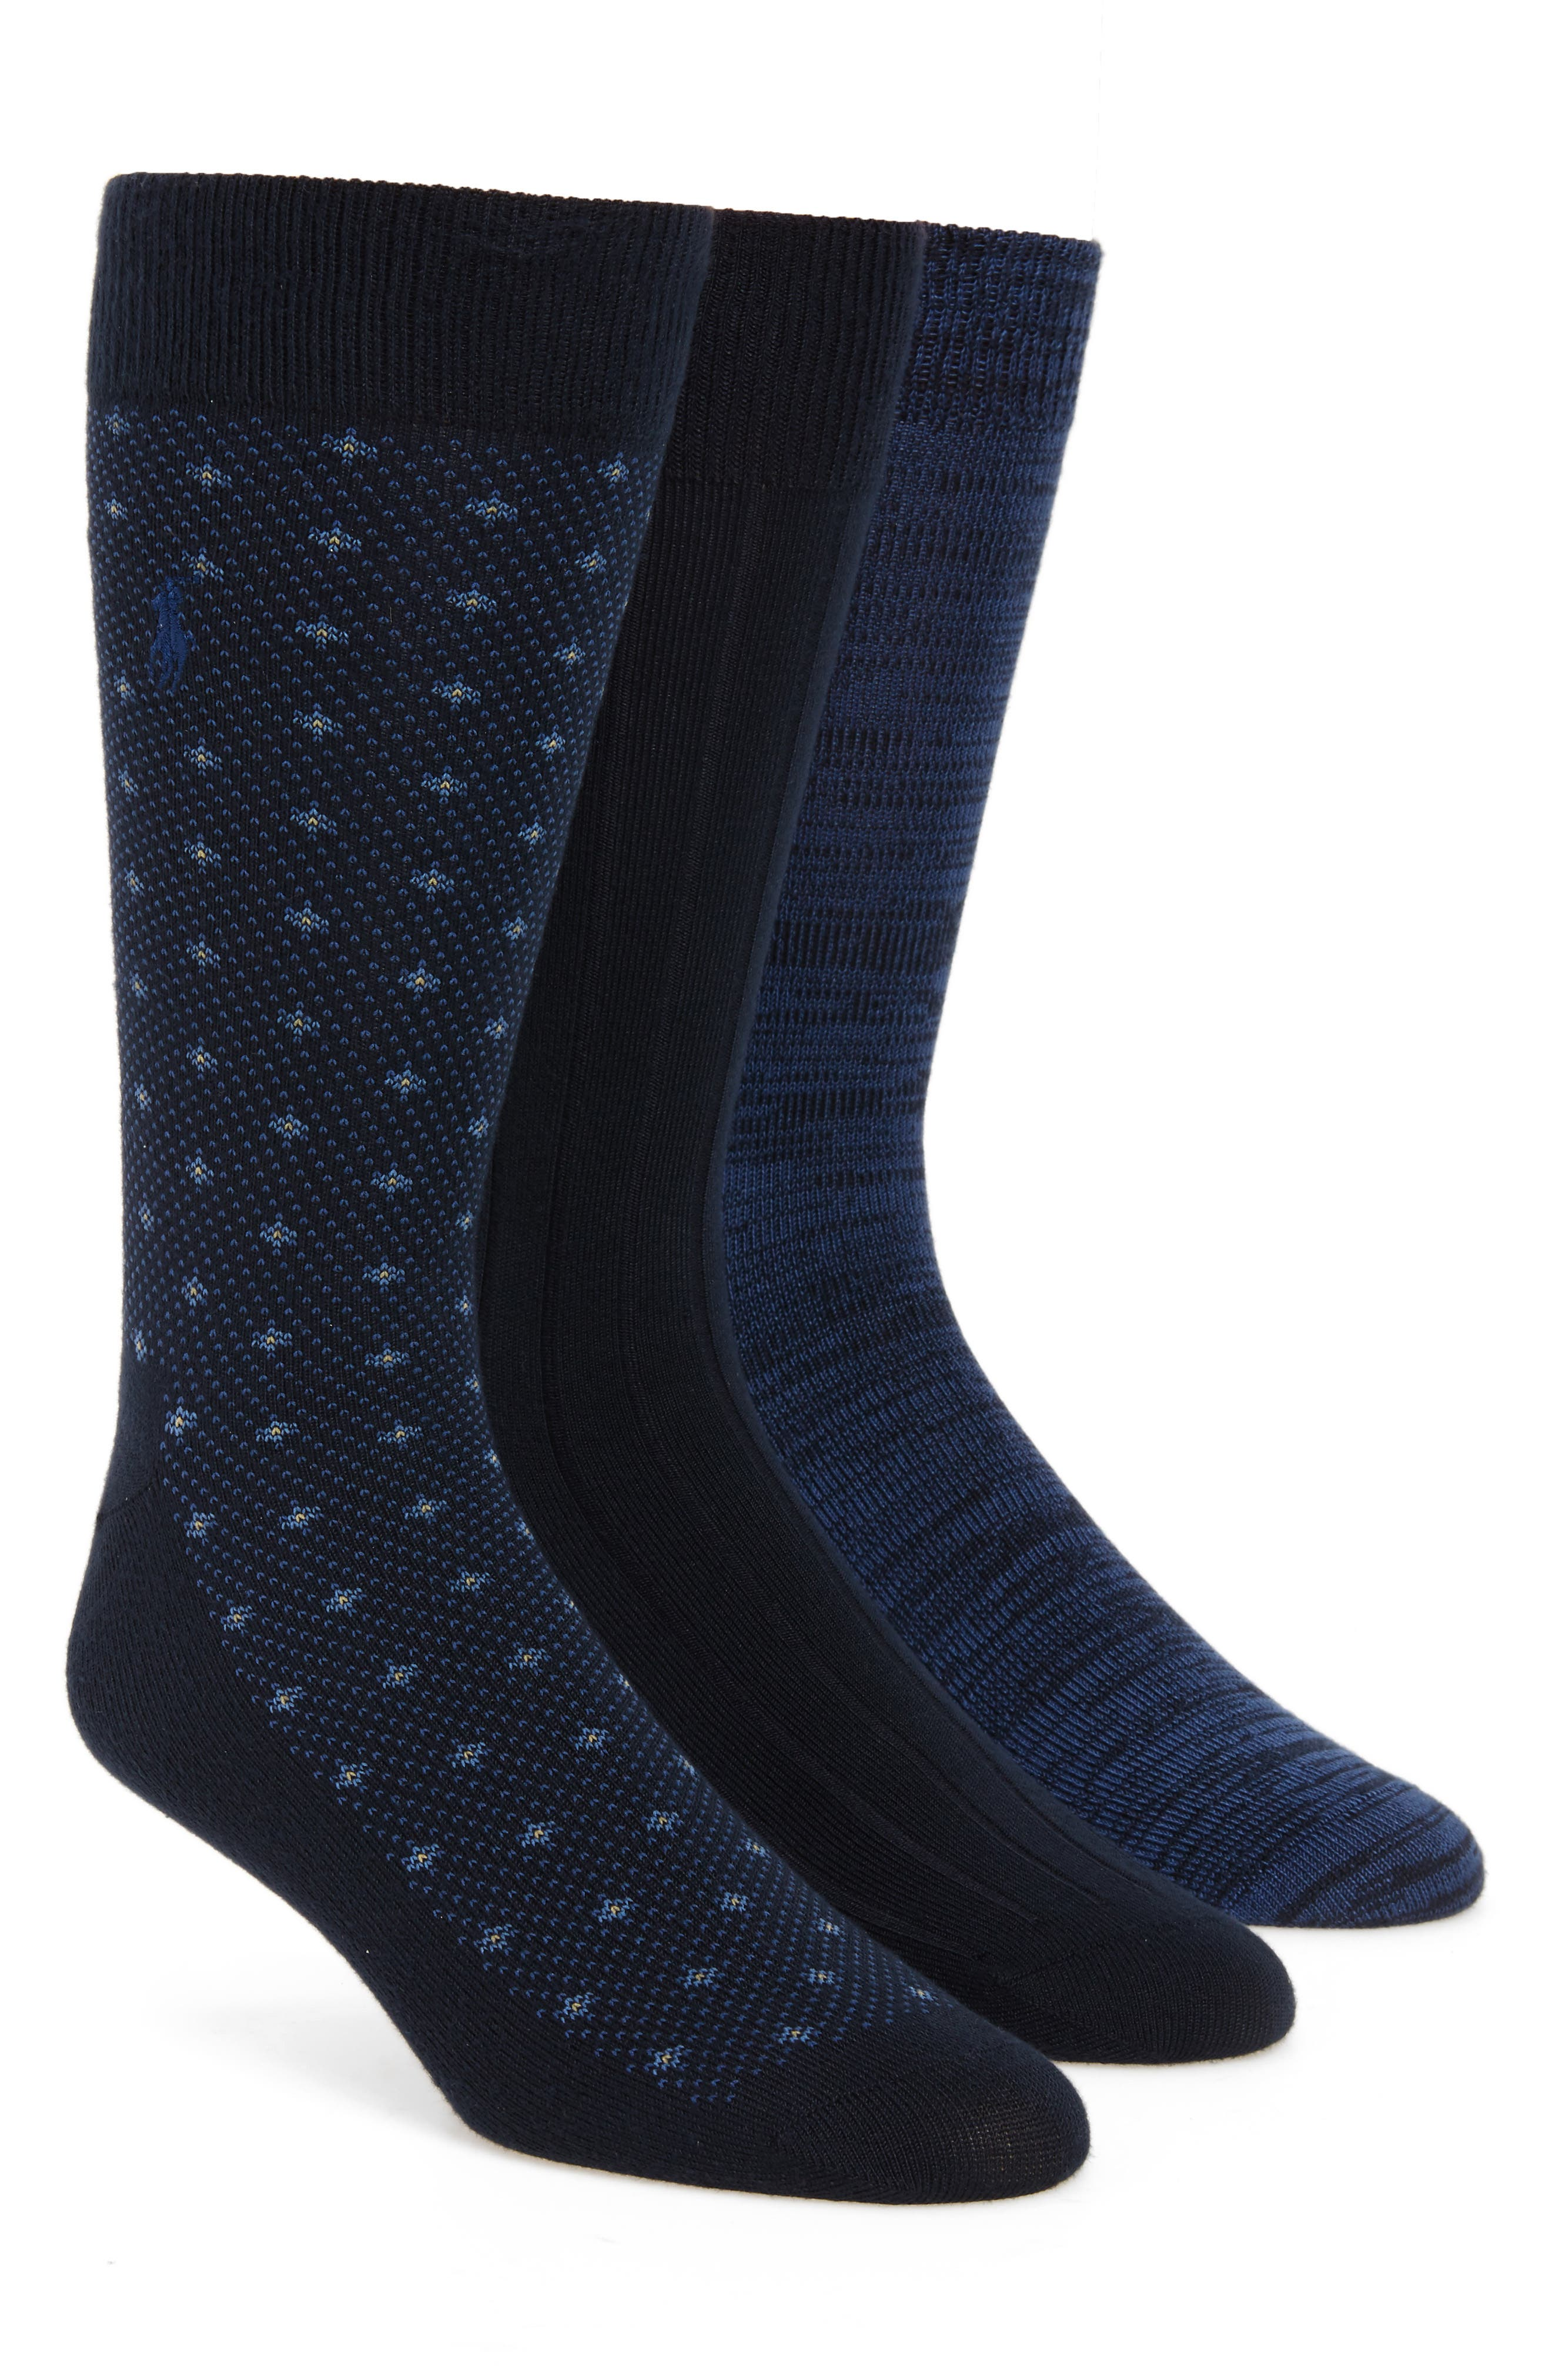 Polo Ralph Lauren Supersoft Diamond Dot Assorted 3-Pack Socks